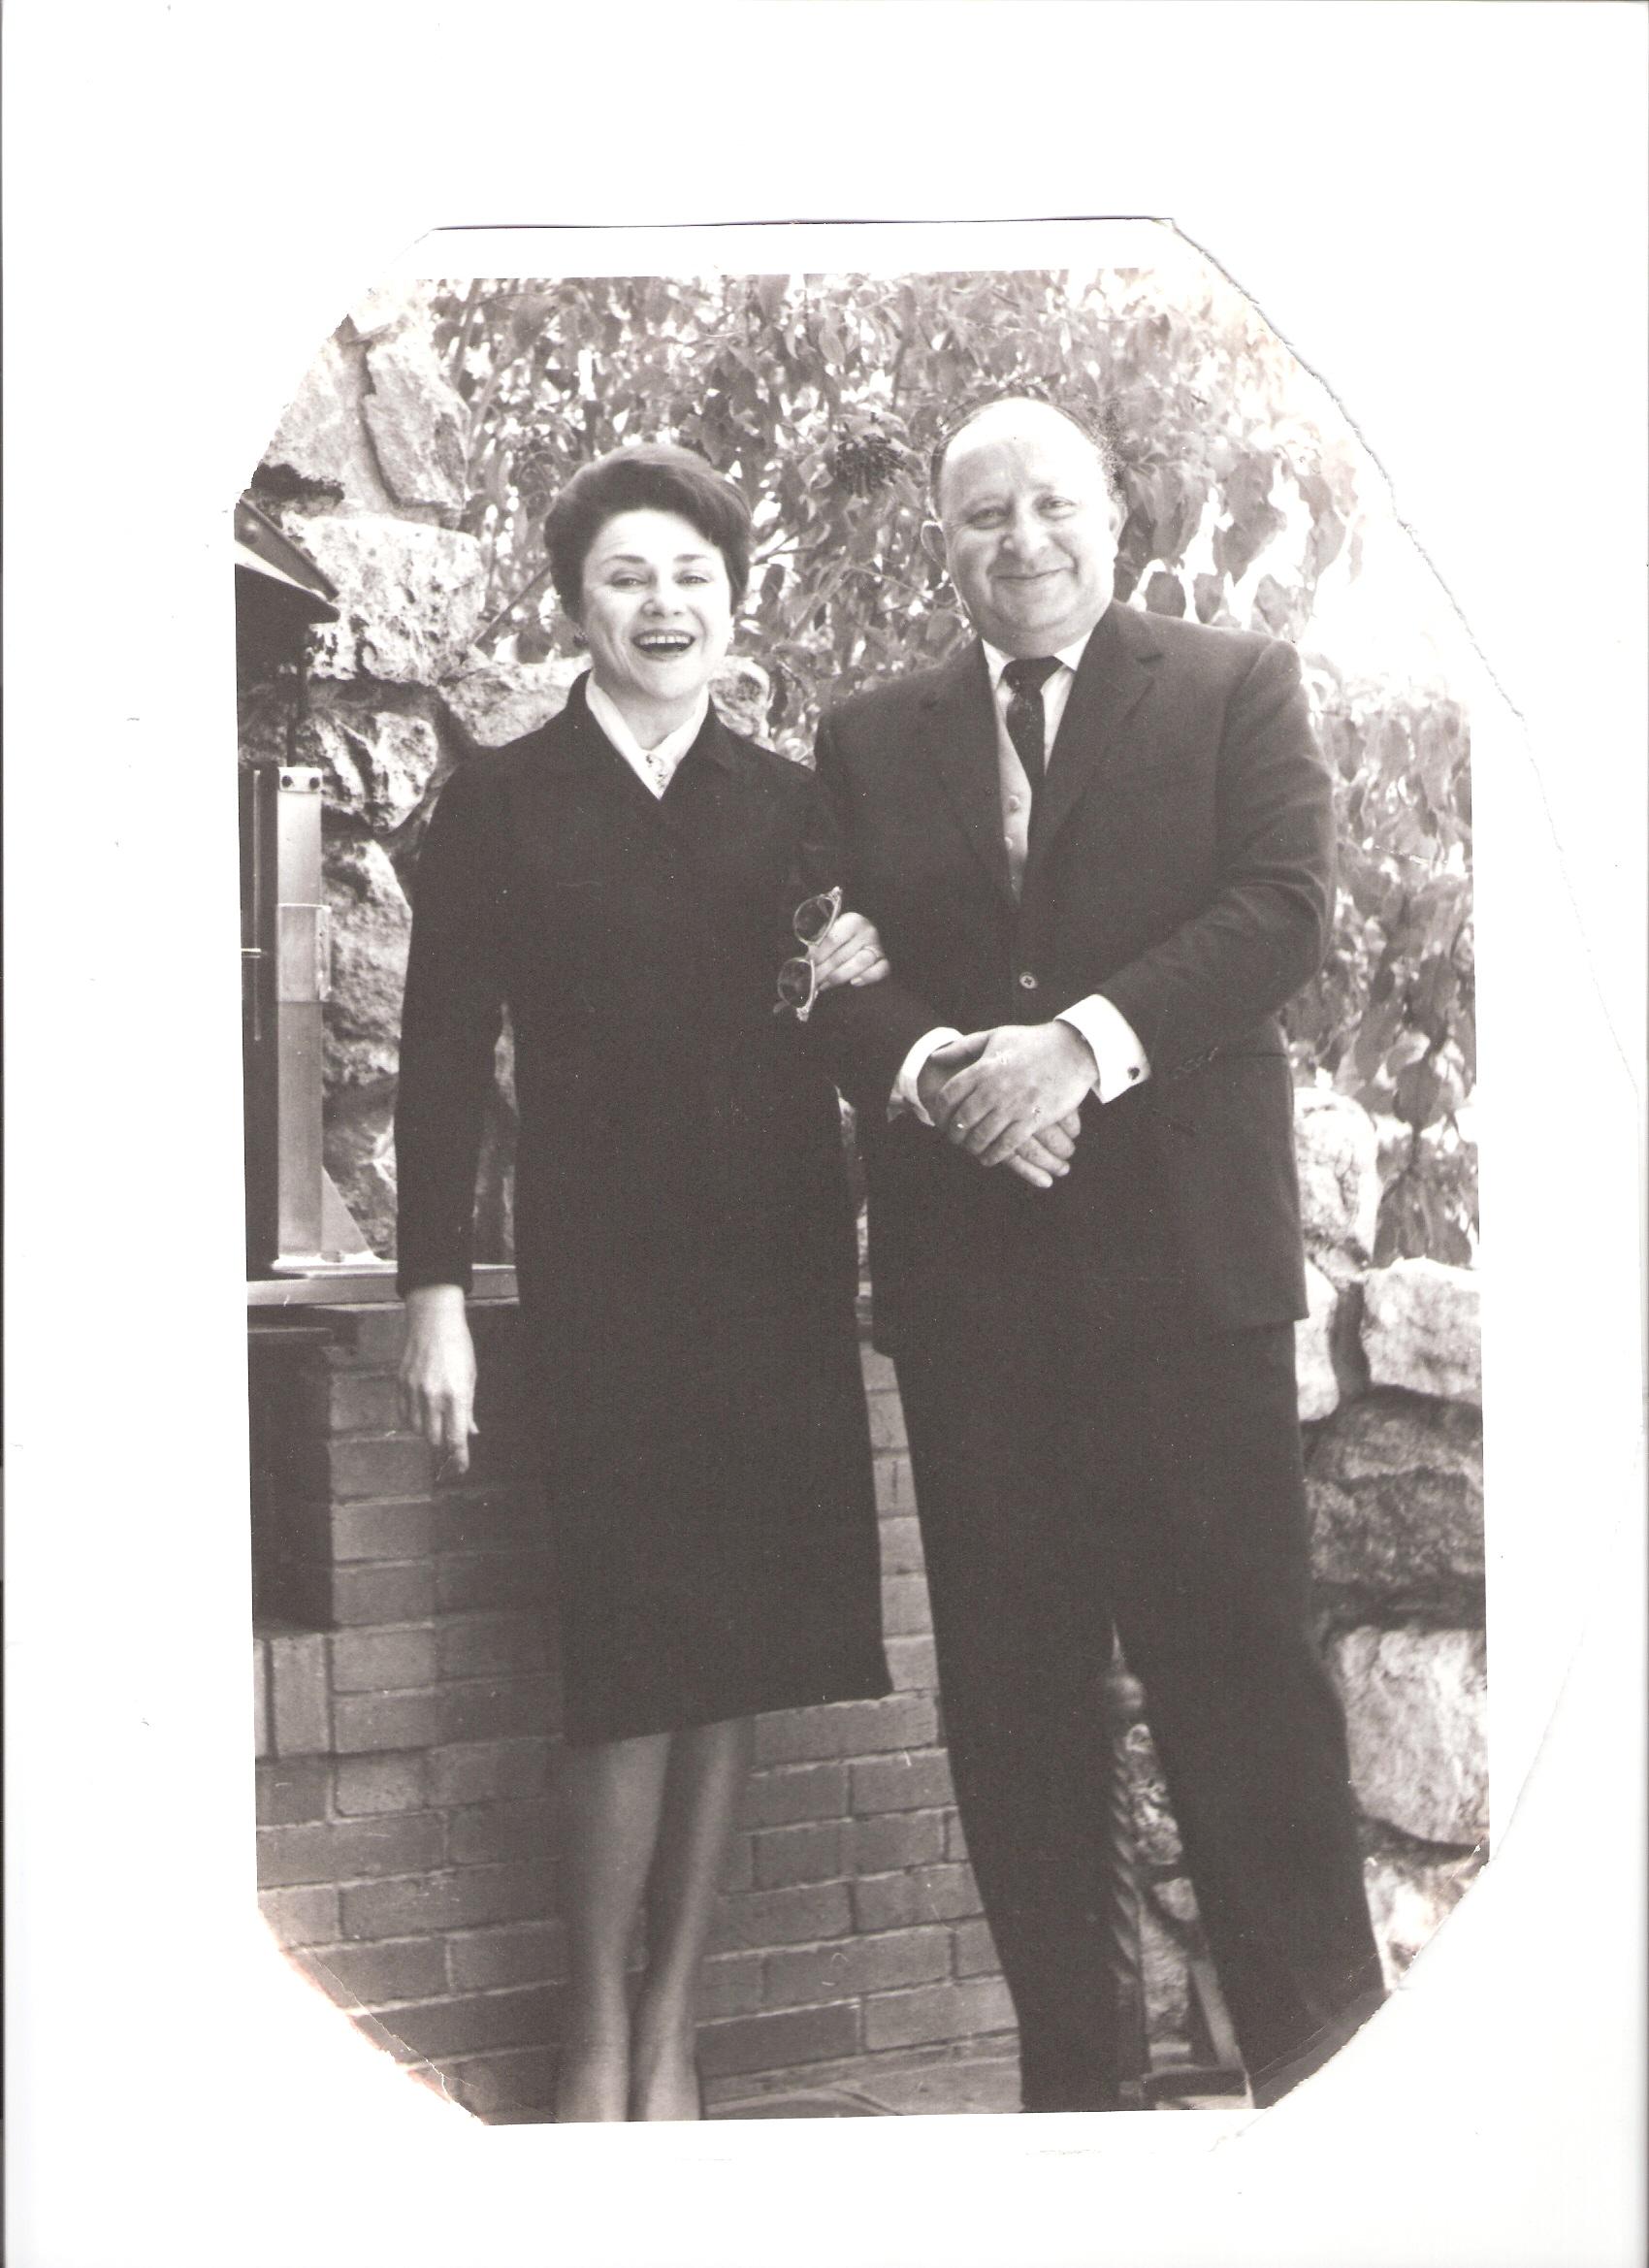 My parents Jack (56)and Norma Estelle Wolfowitz(nee Cohen)(46)